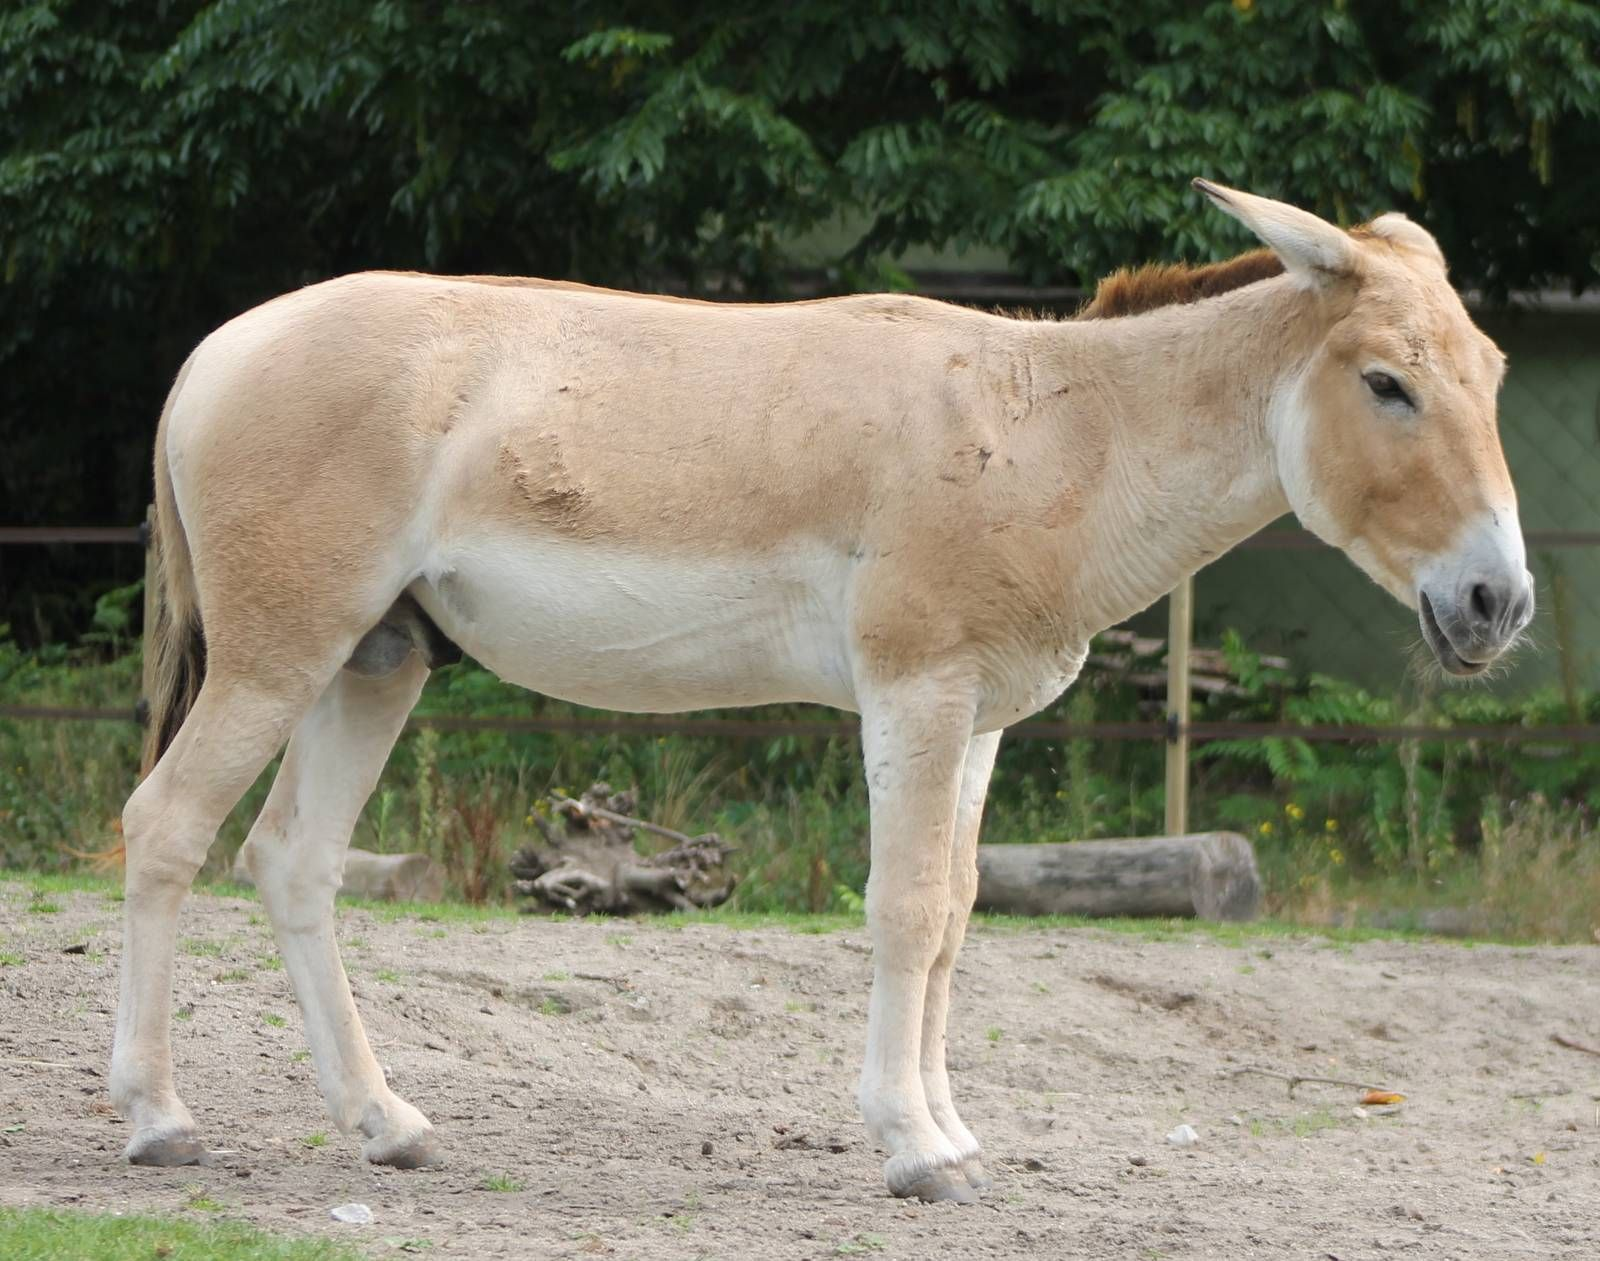 Onager (Equus hemionus) Big animals, Mammals, Horse breeds